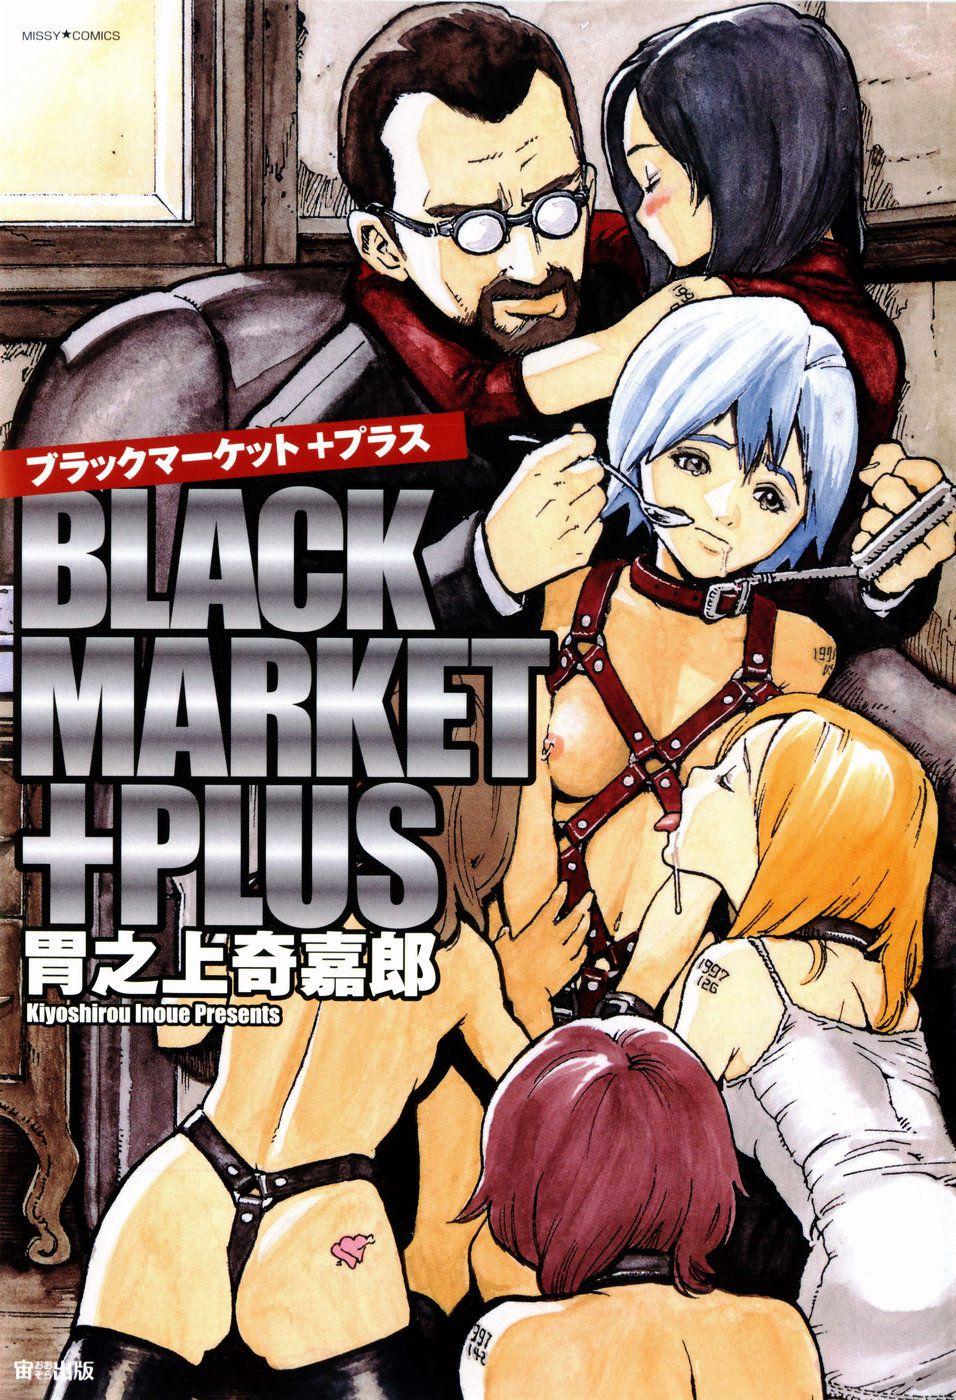 Inoue Kiyoshirou (PERESTROIKA) - Сборник хентай манги [Ptcen] [ENG,JAP,RUS] Manga Hentai